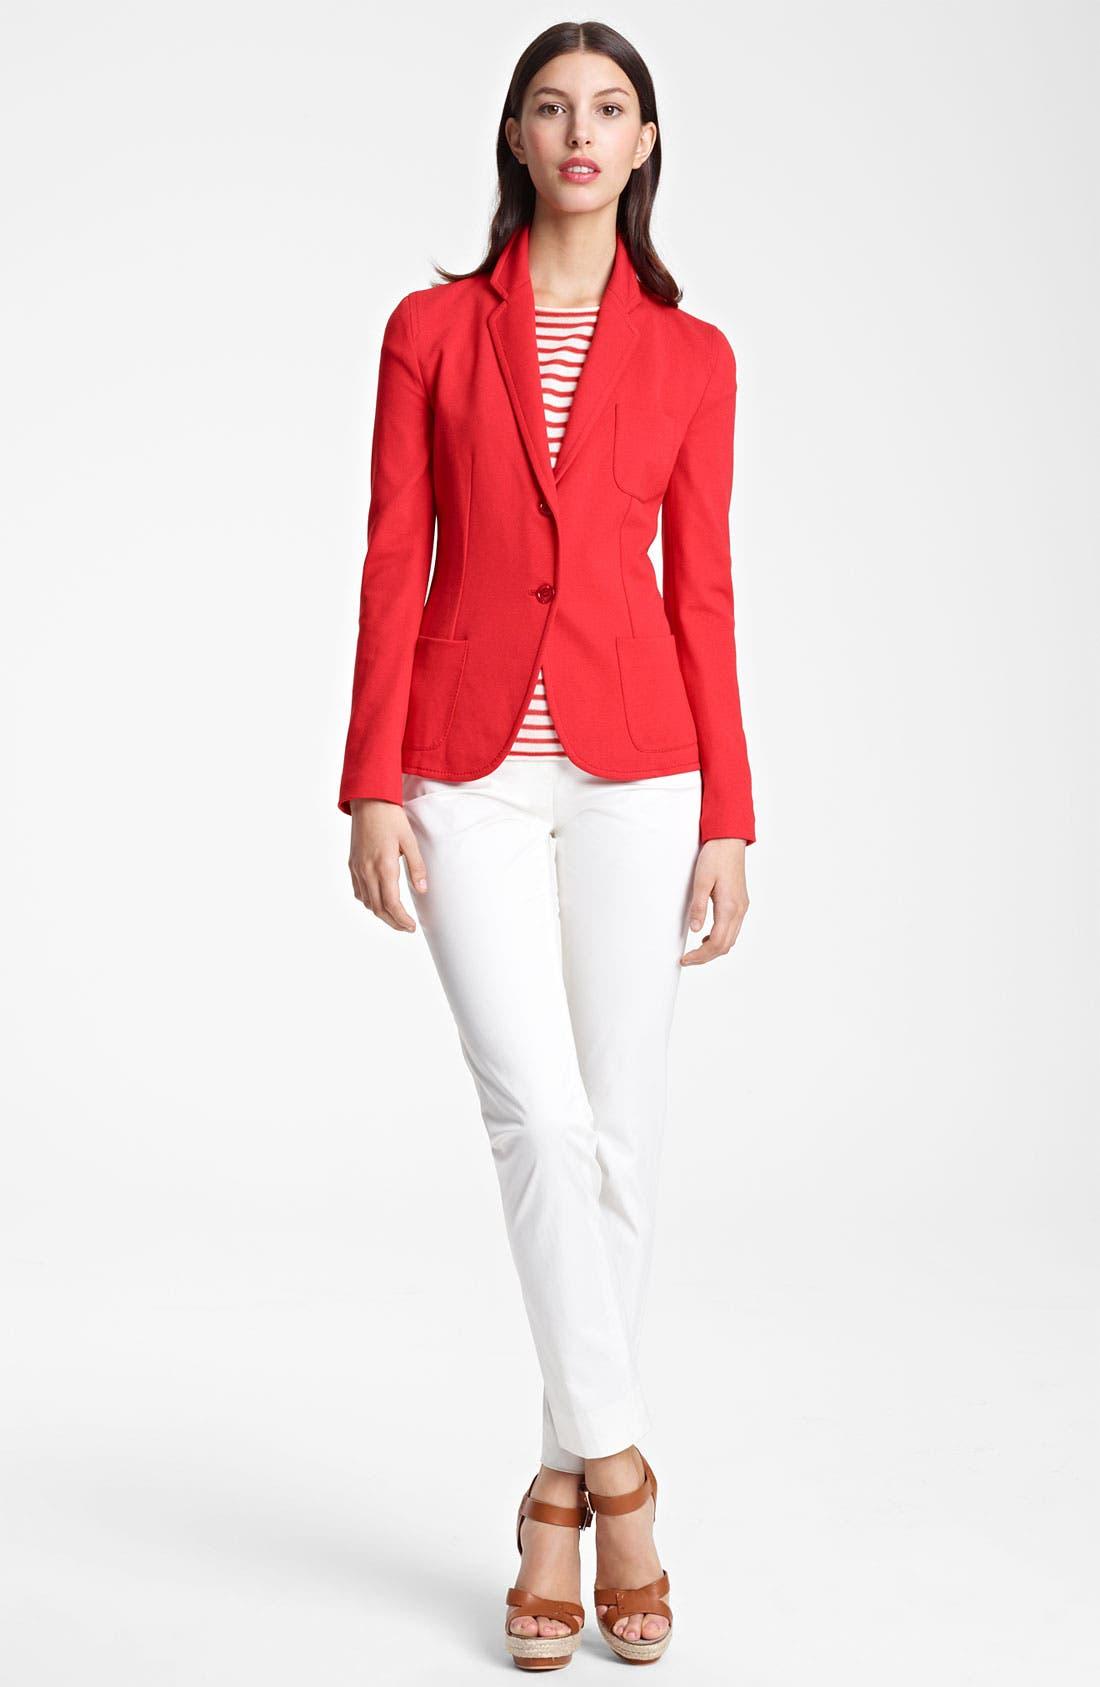 Main Image - Armani Collezioni Jacket, Top & Pants